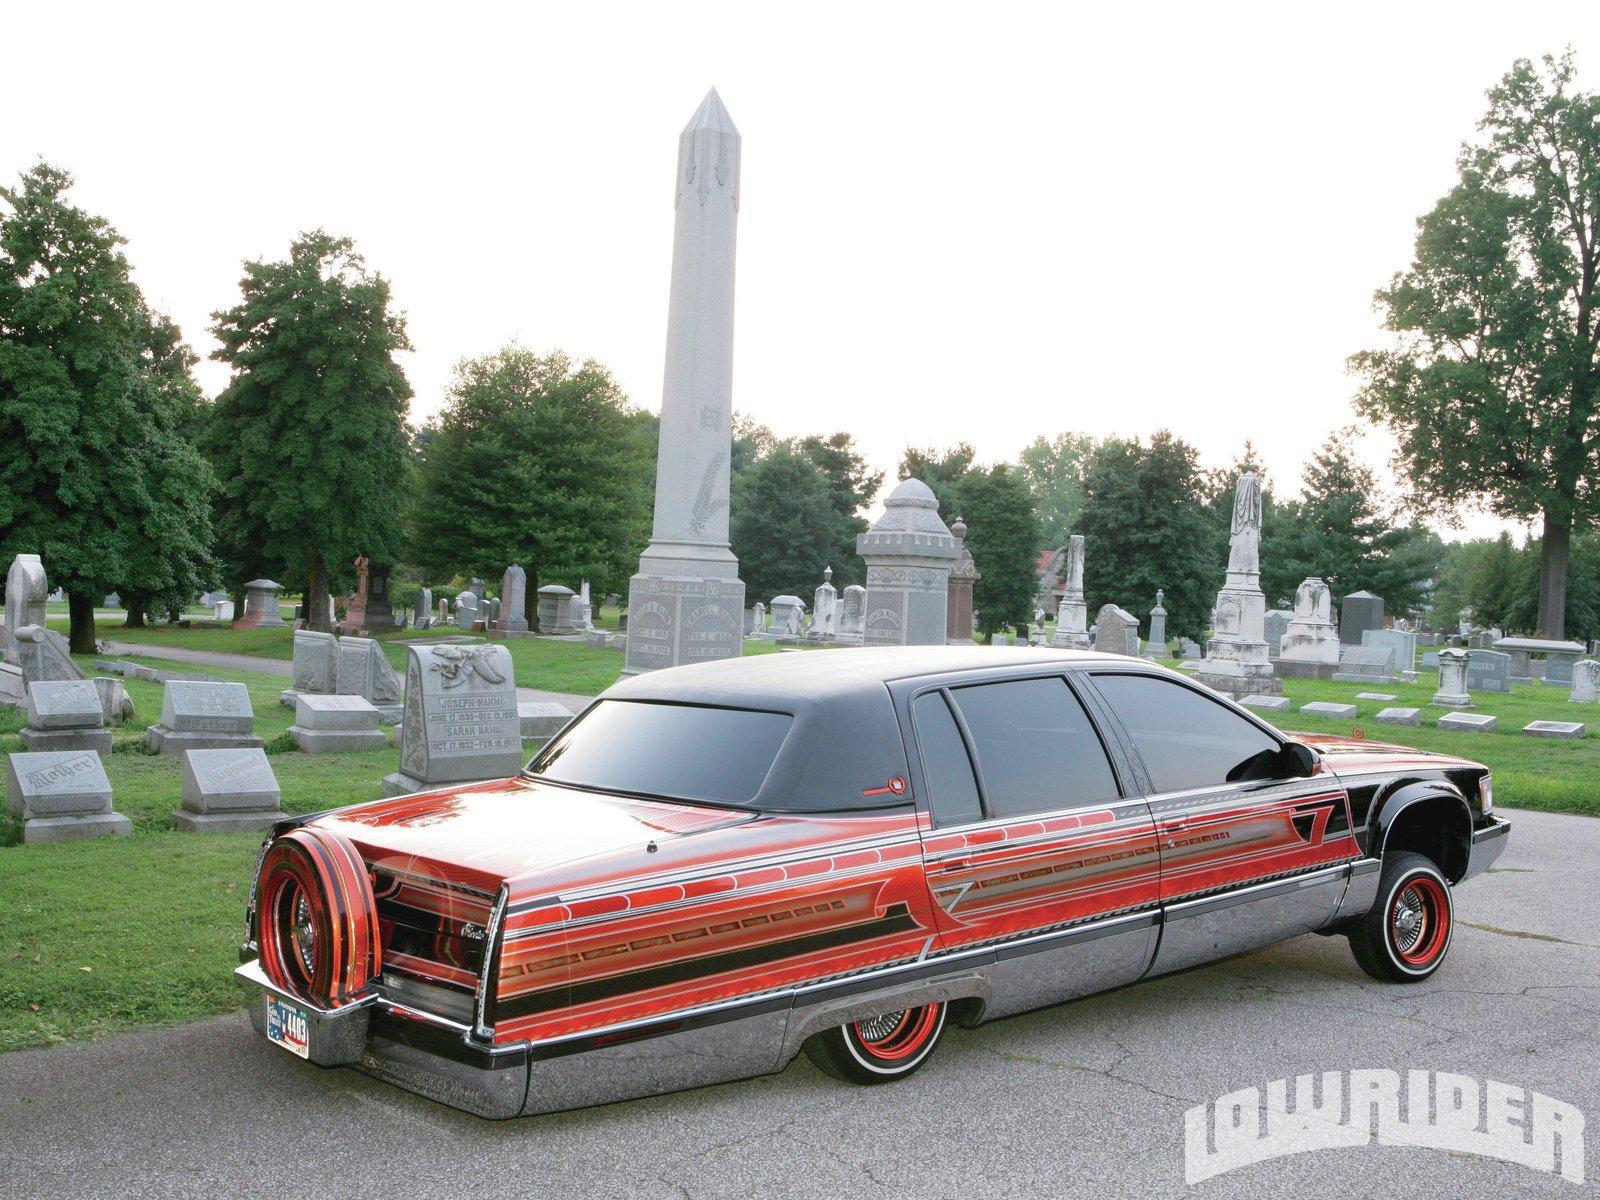 1995 Cadillac Fleetwood - Lowrider Magazine